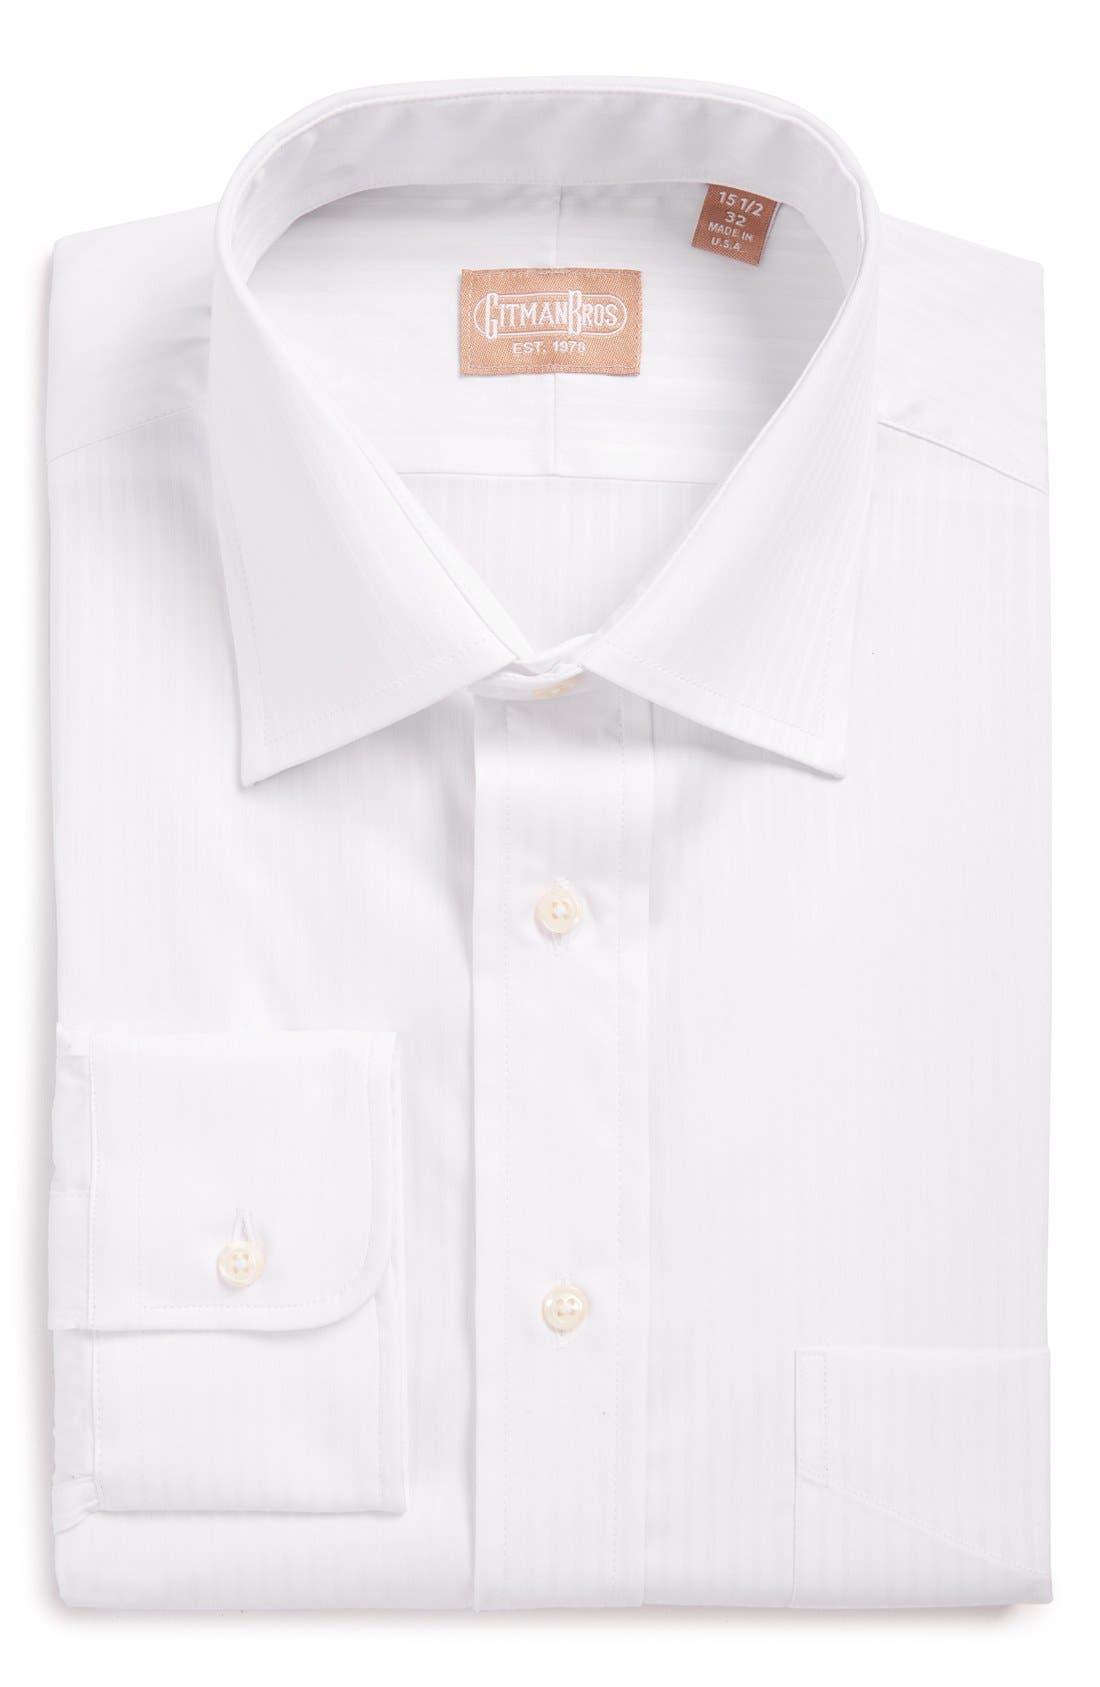 Regular Fit Tonal Stripe Twill Dress Shirt,                         Main,                         color, 100